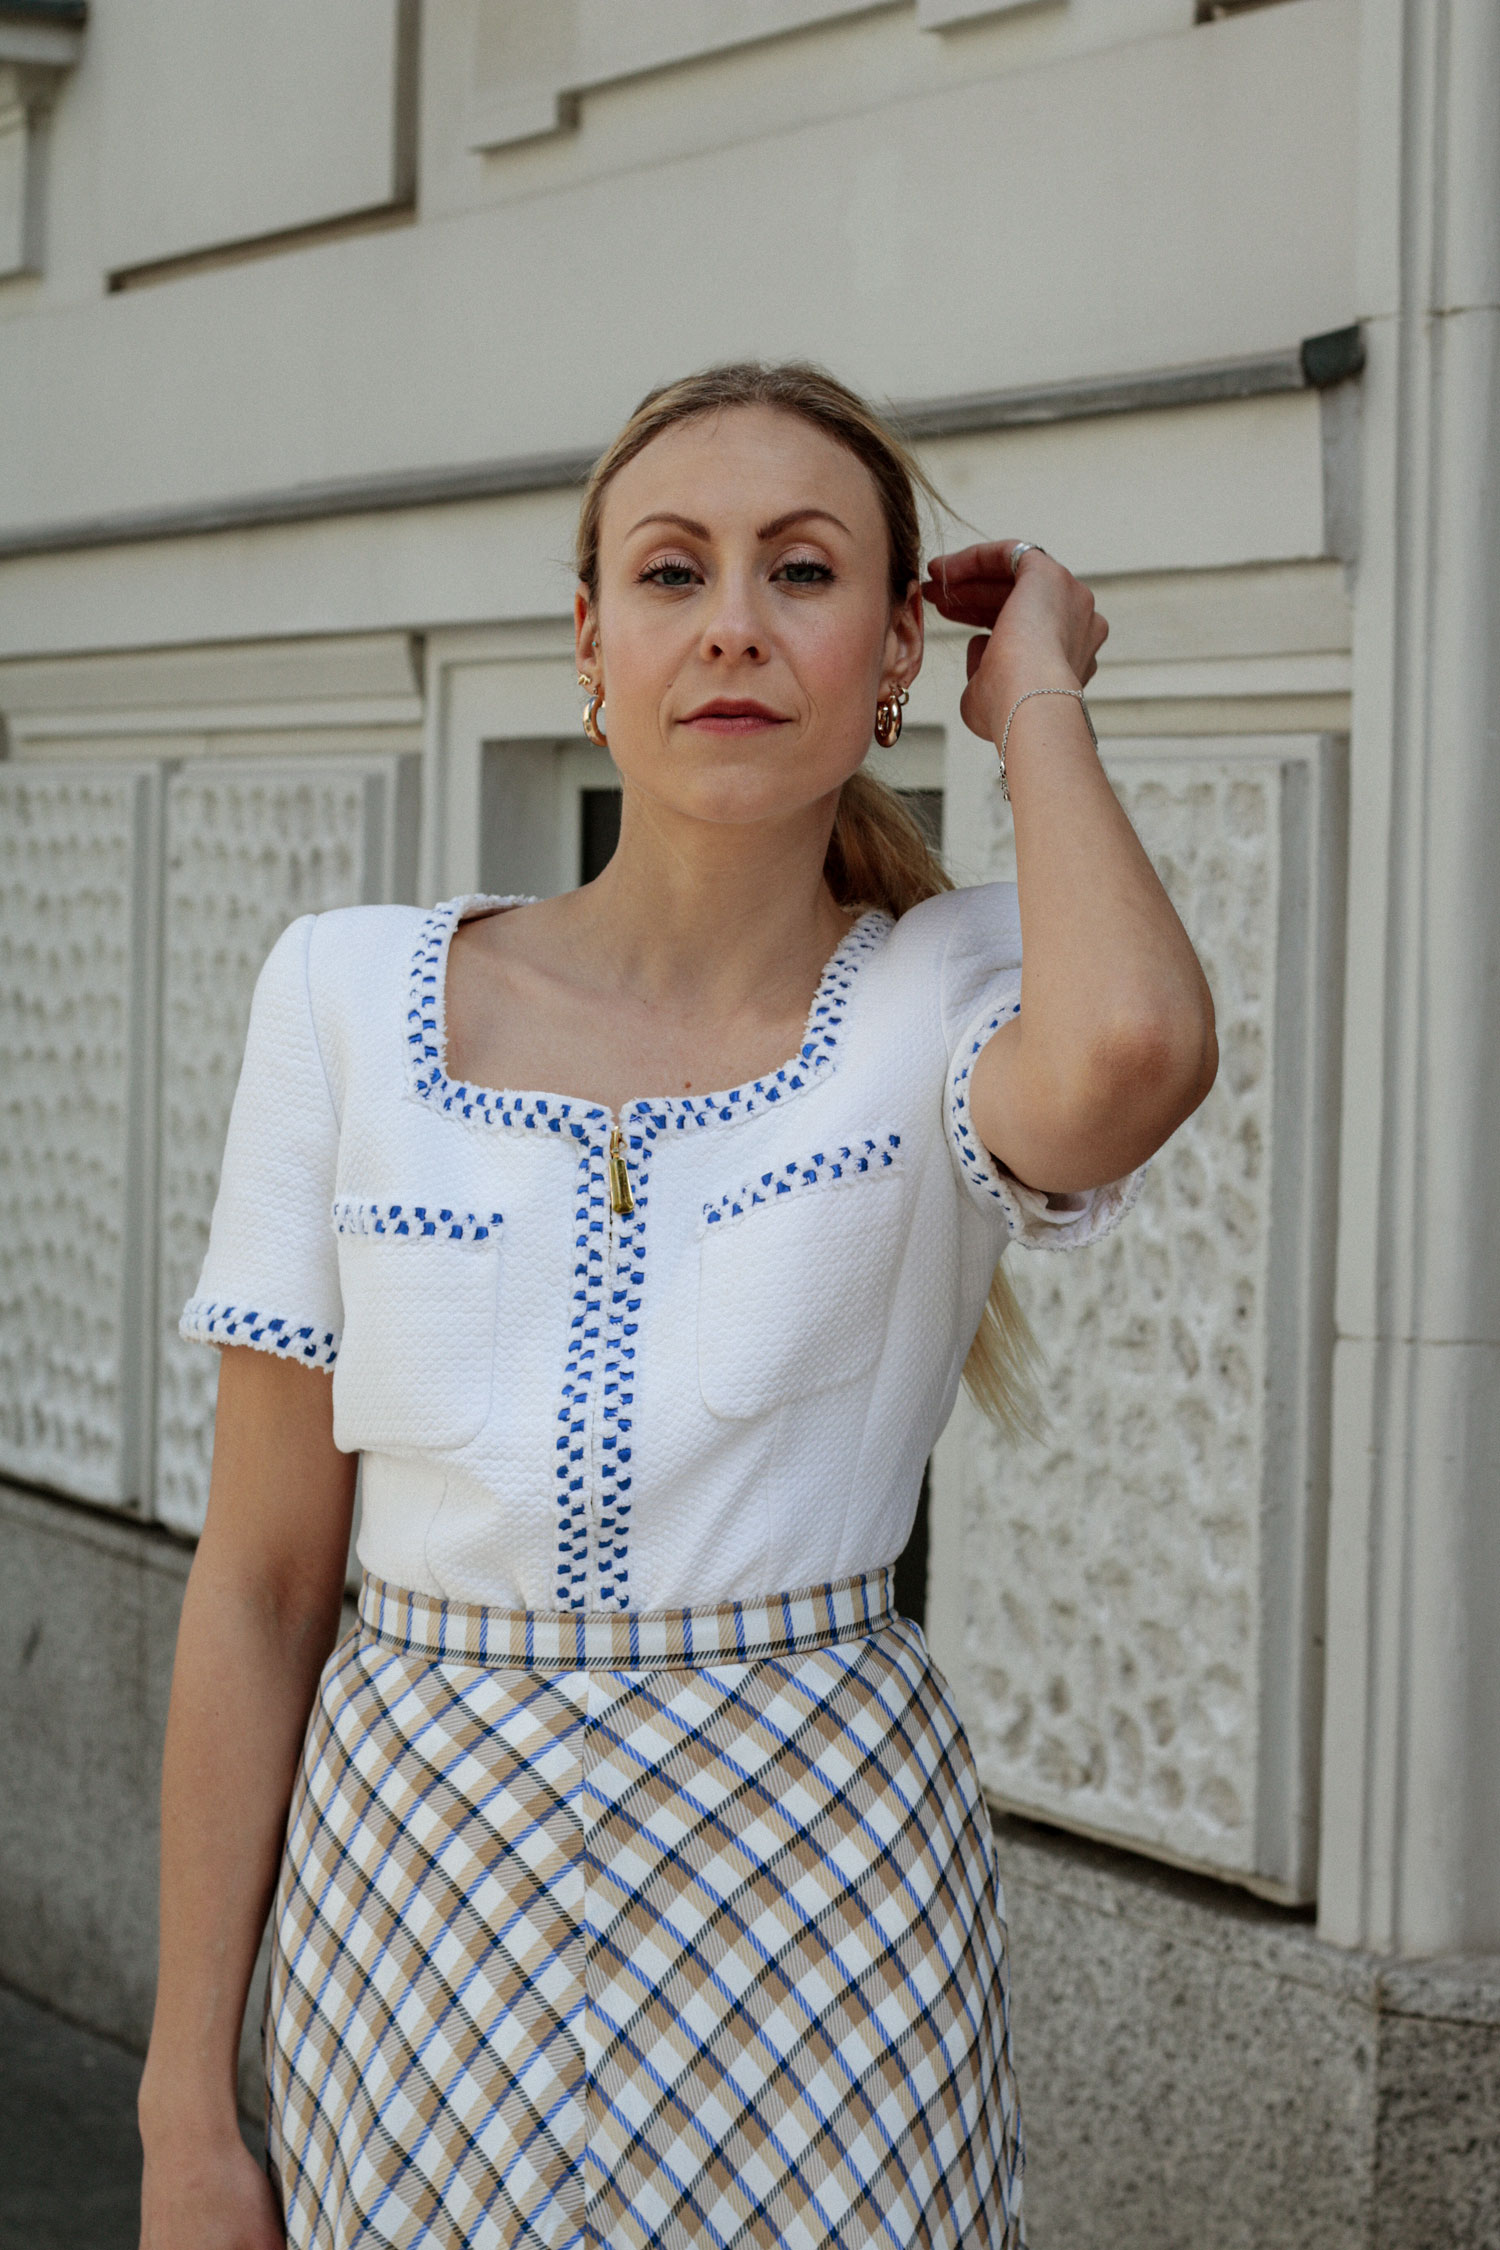 Blanket Skirt - www.lesfactoryfemmes.com